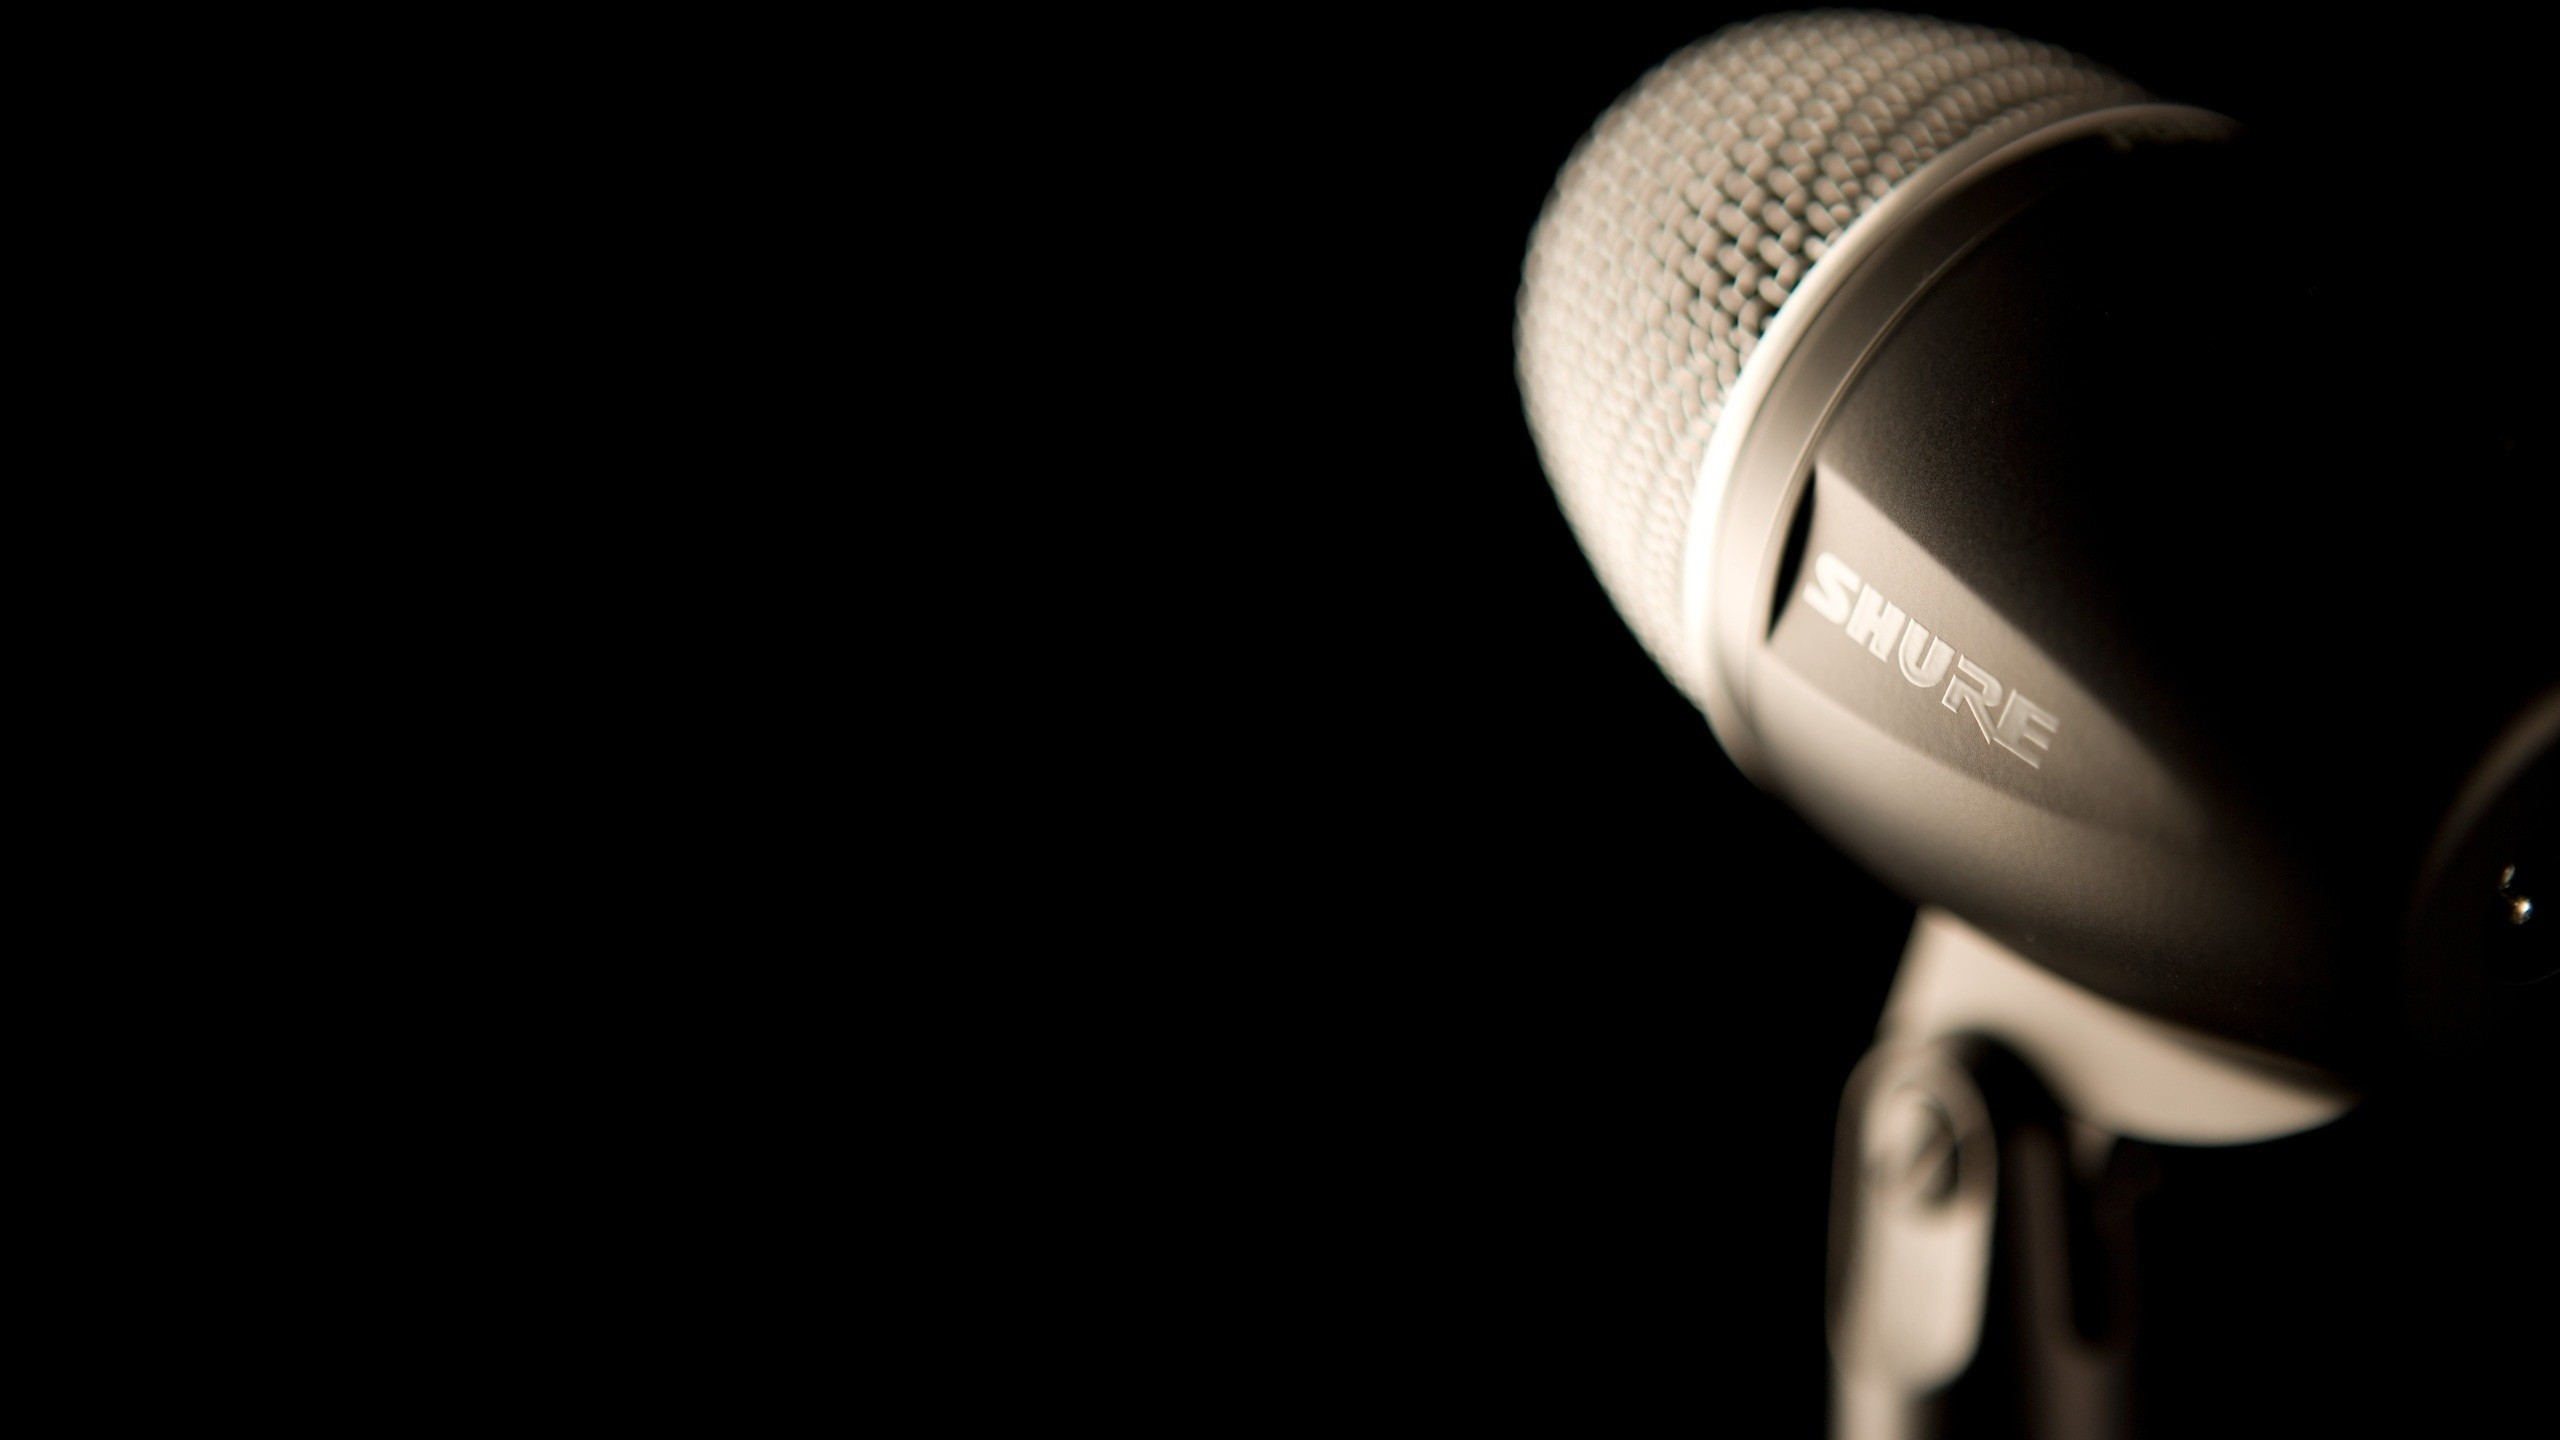 Black Shure Studio Microphone